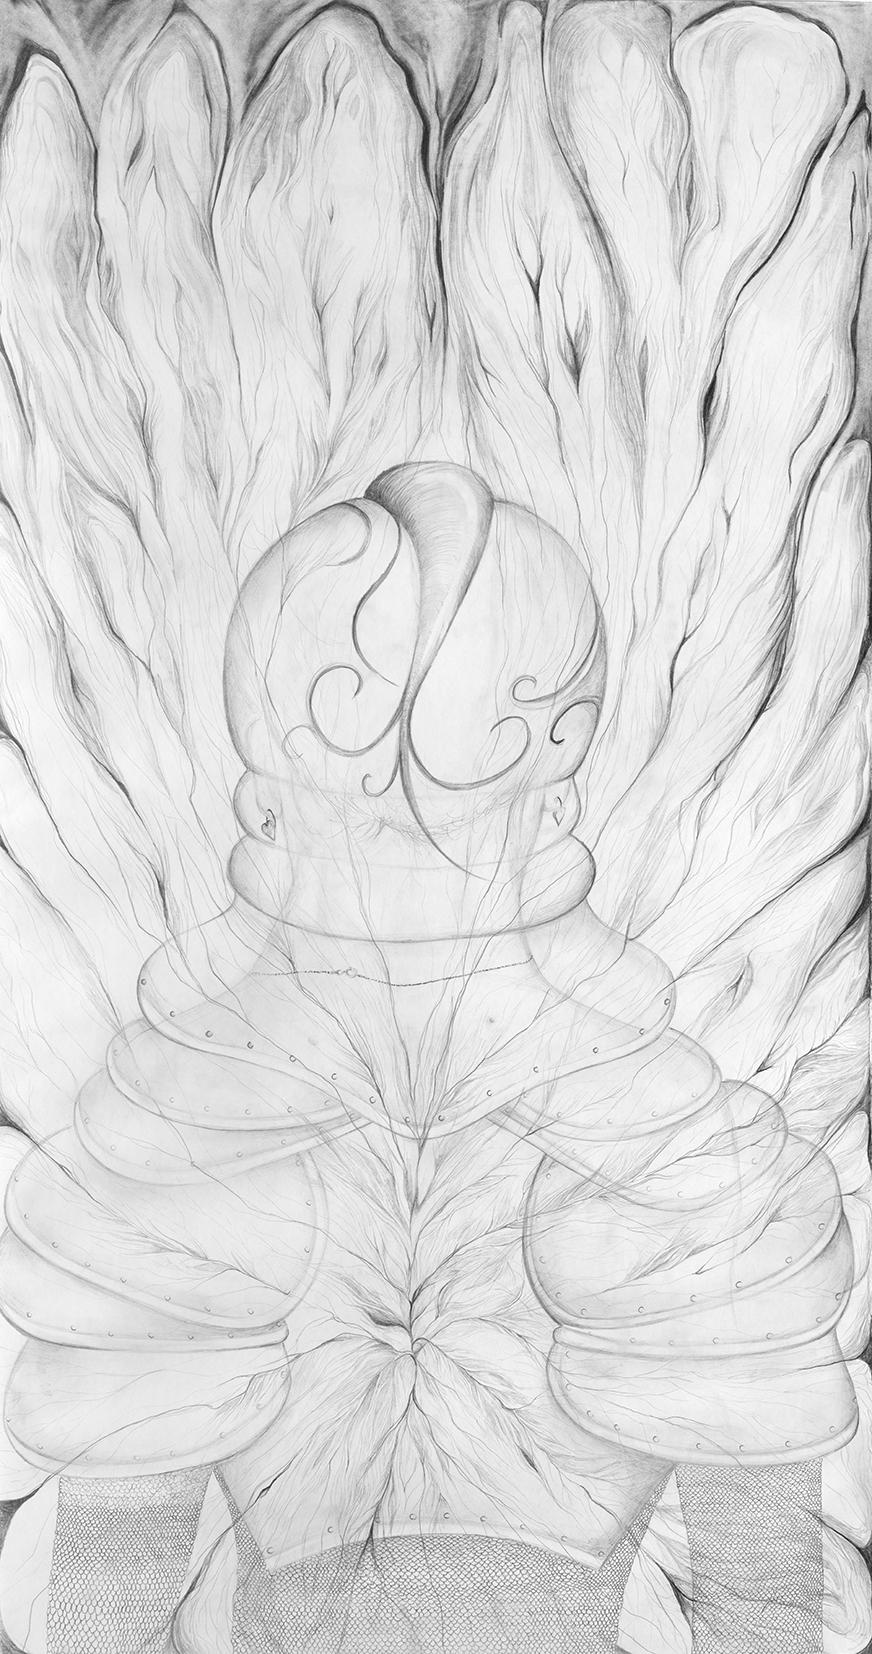 Under armored wings #1 By Nurit Barak kachtan